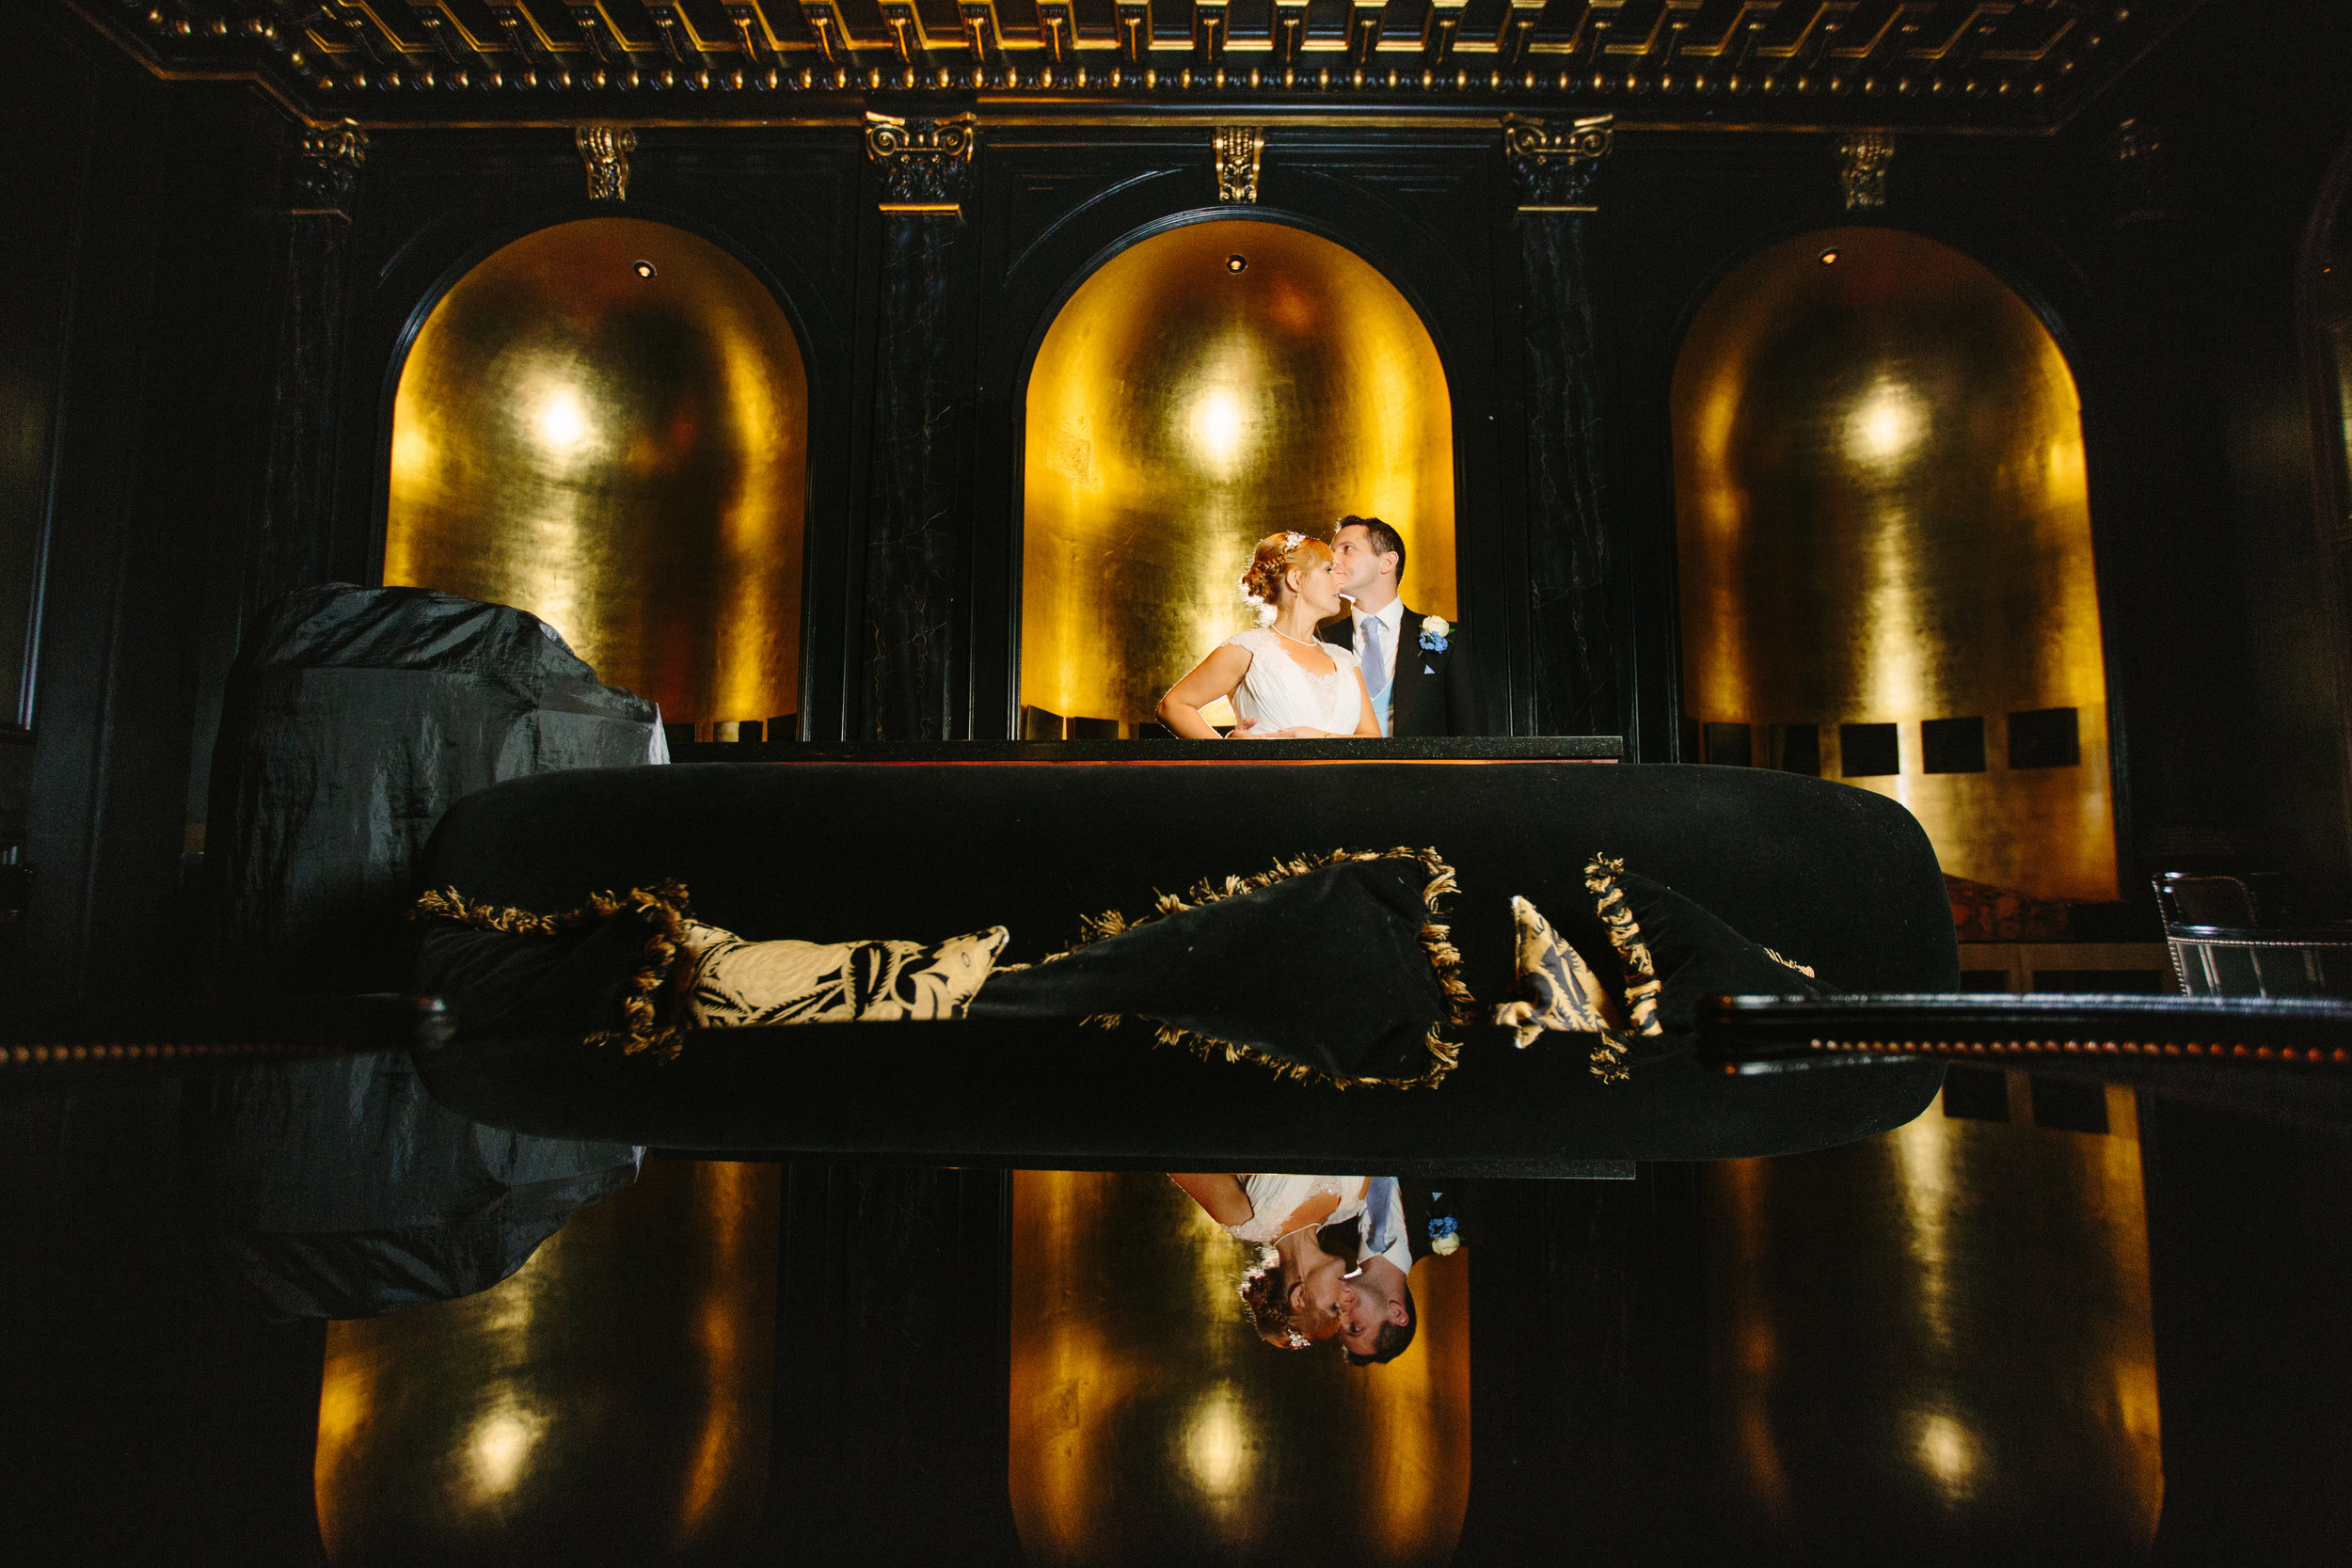 london-wedding-photography-savoy-hotel-beaufort-bar-portrait-1